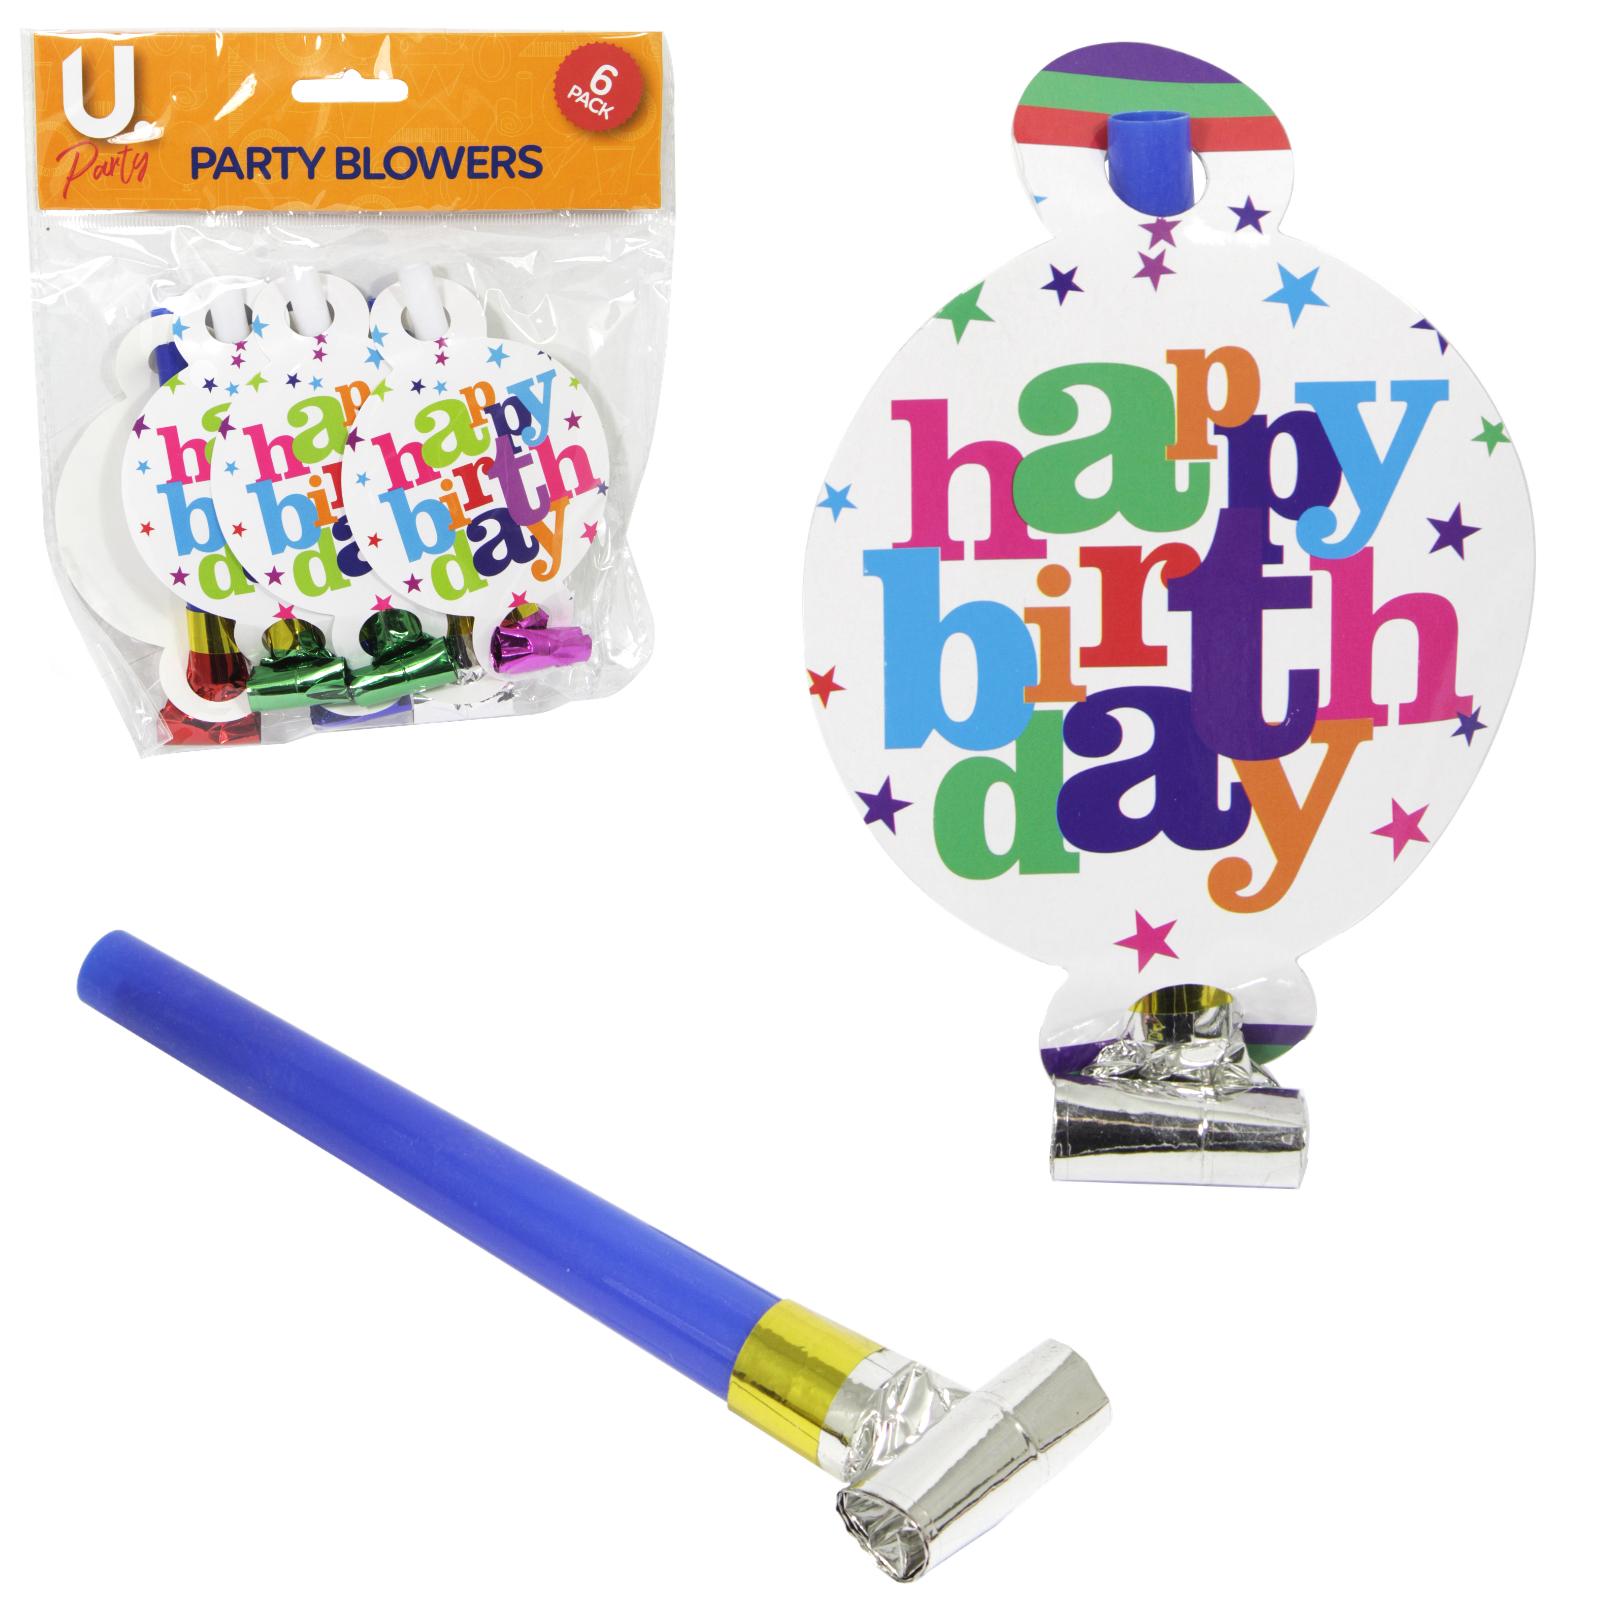 HAPPY BIRTHDAY PARTY BLOWERS 8PK